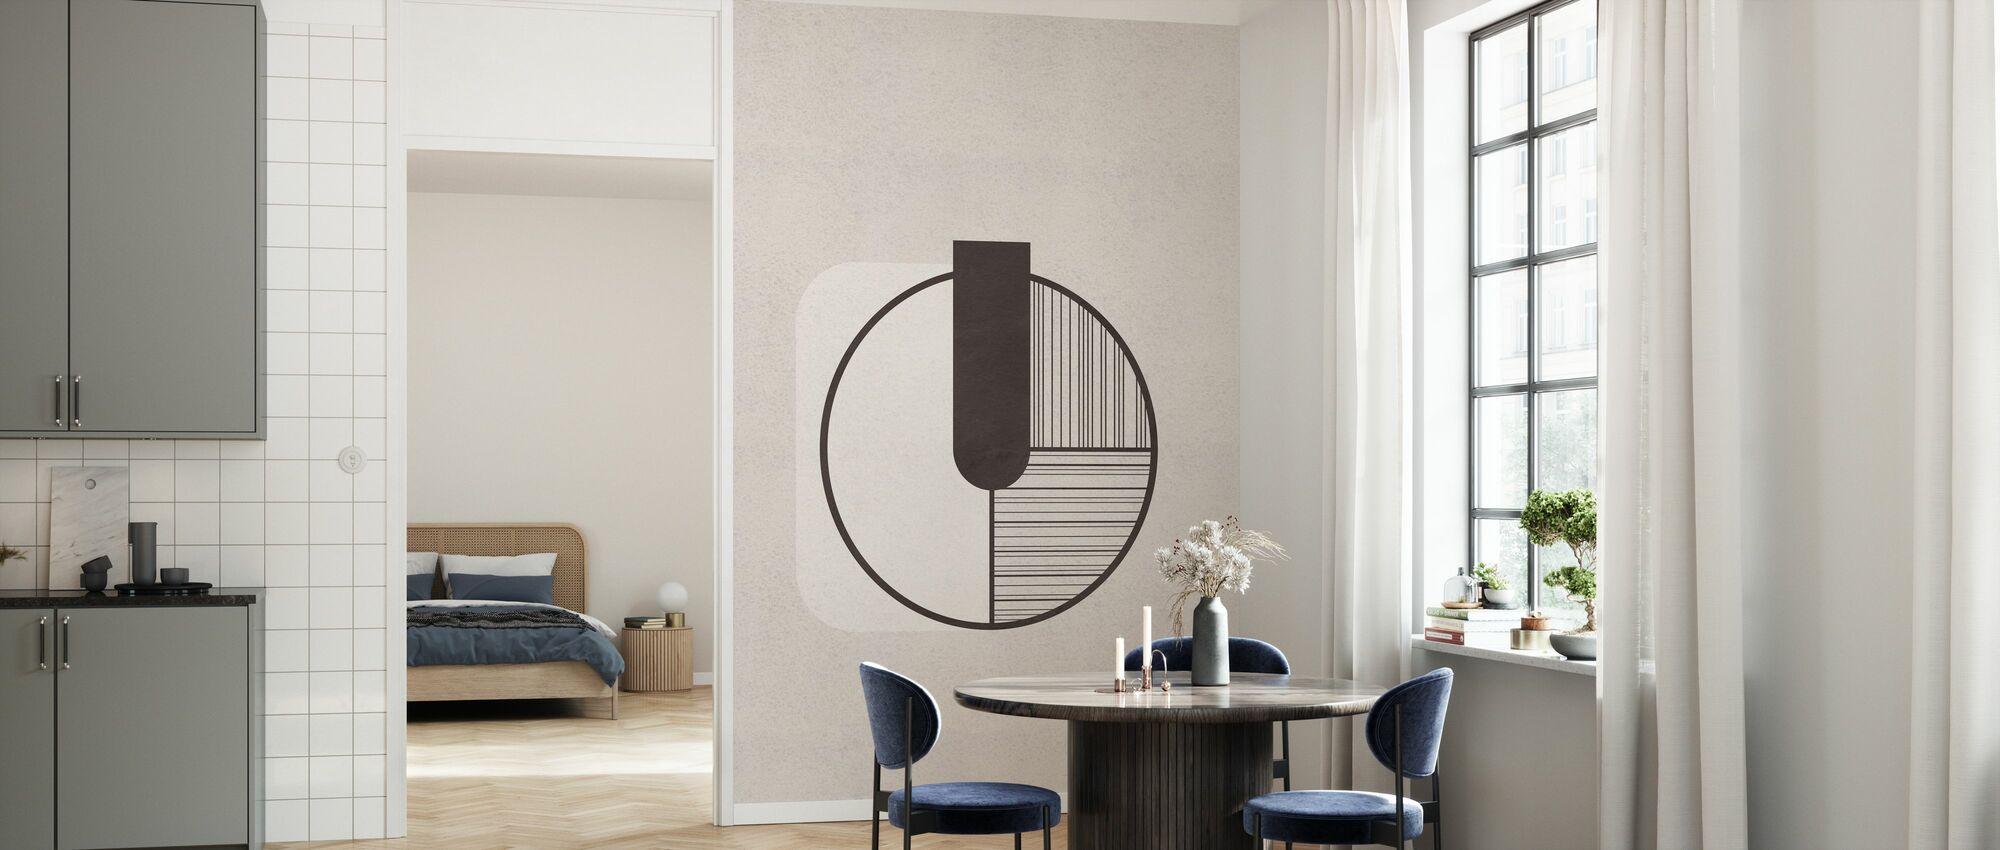 Interval - Behang - Keuken